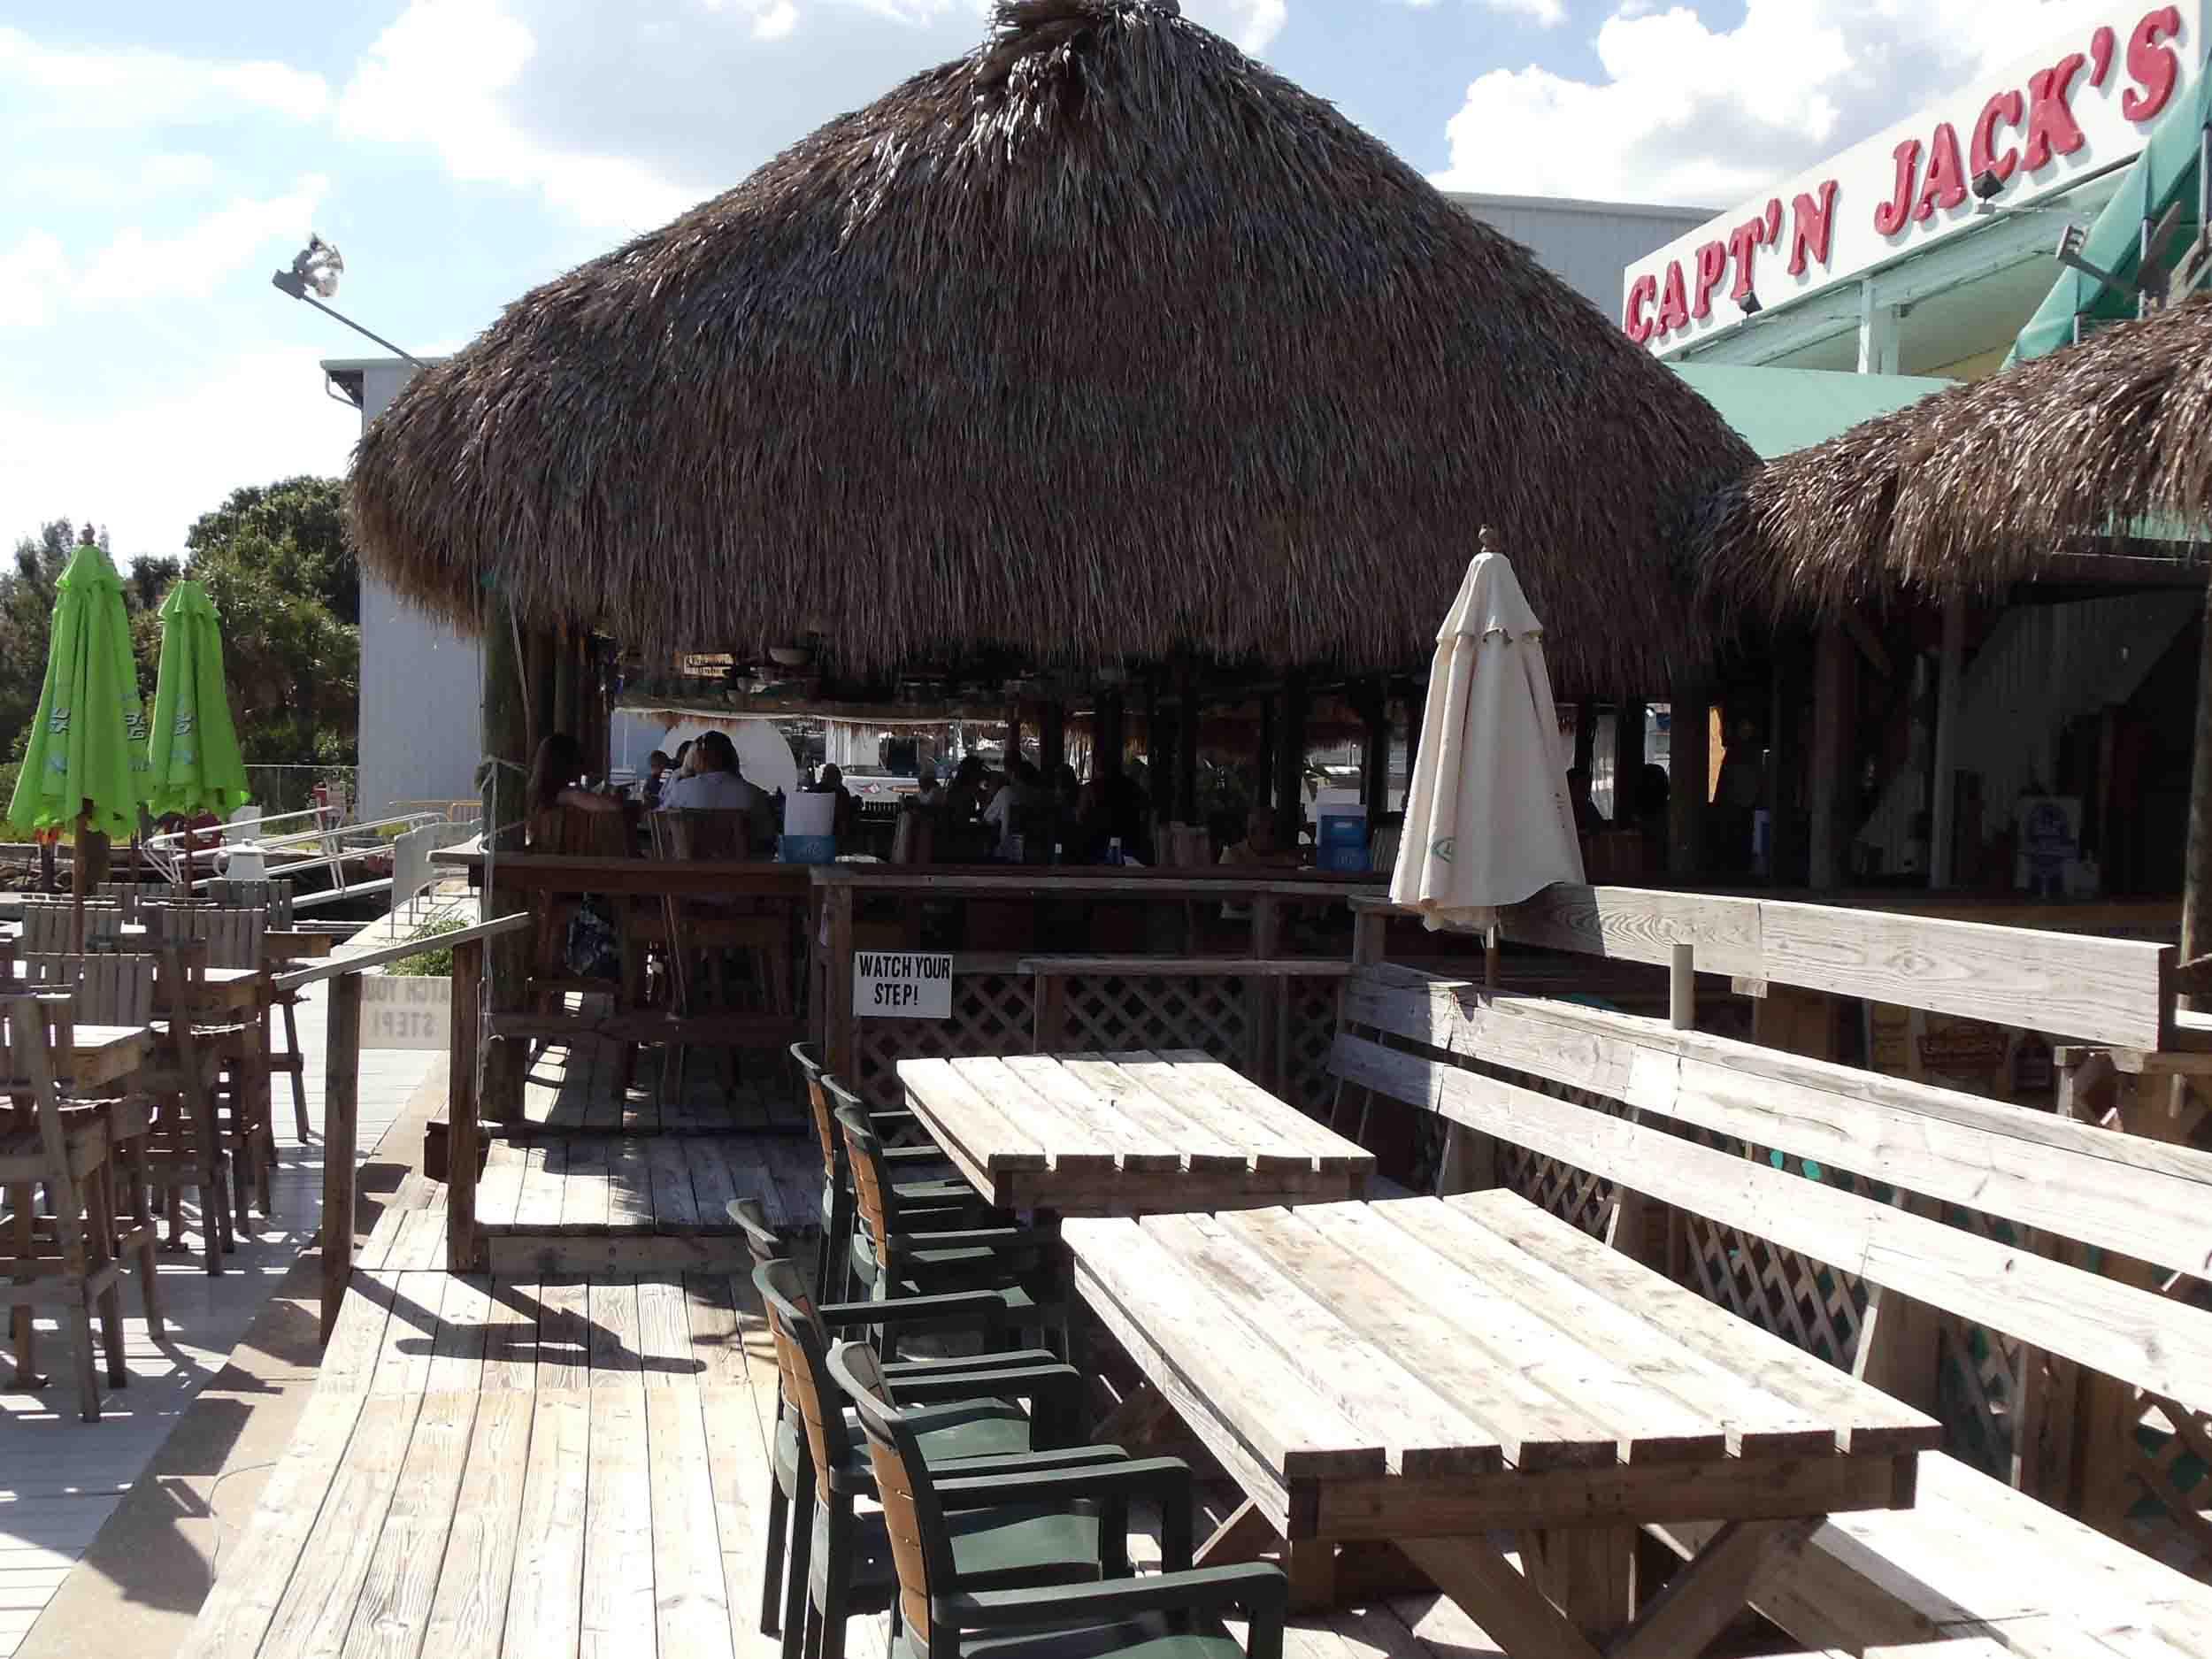 Capt'n Jack's Bar and Grill Tiki Hut